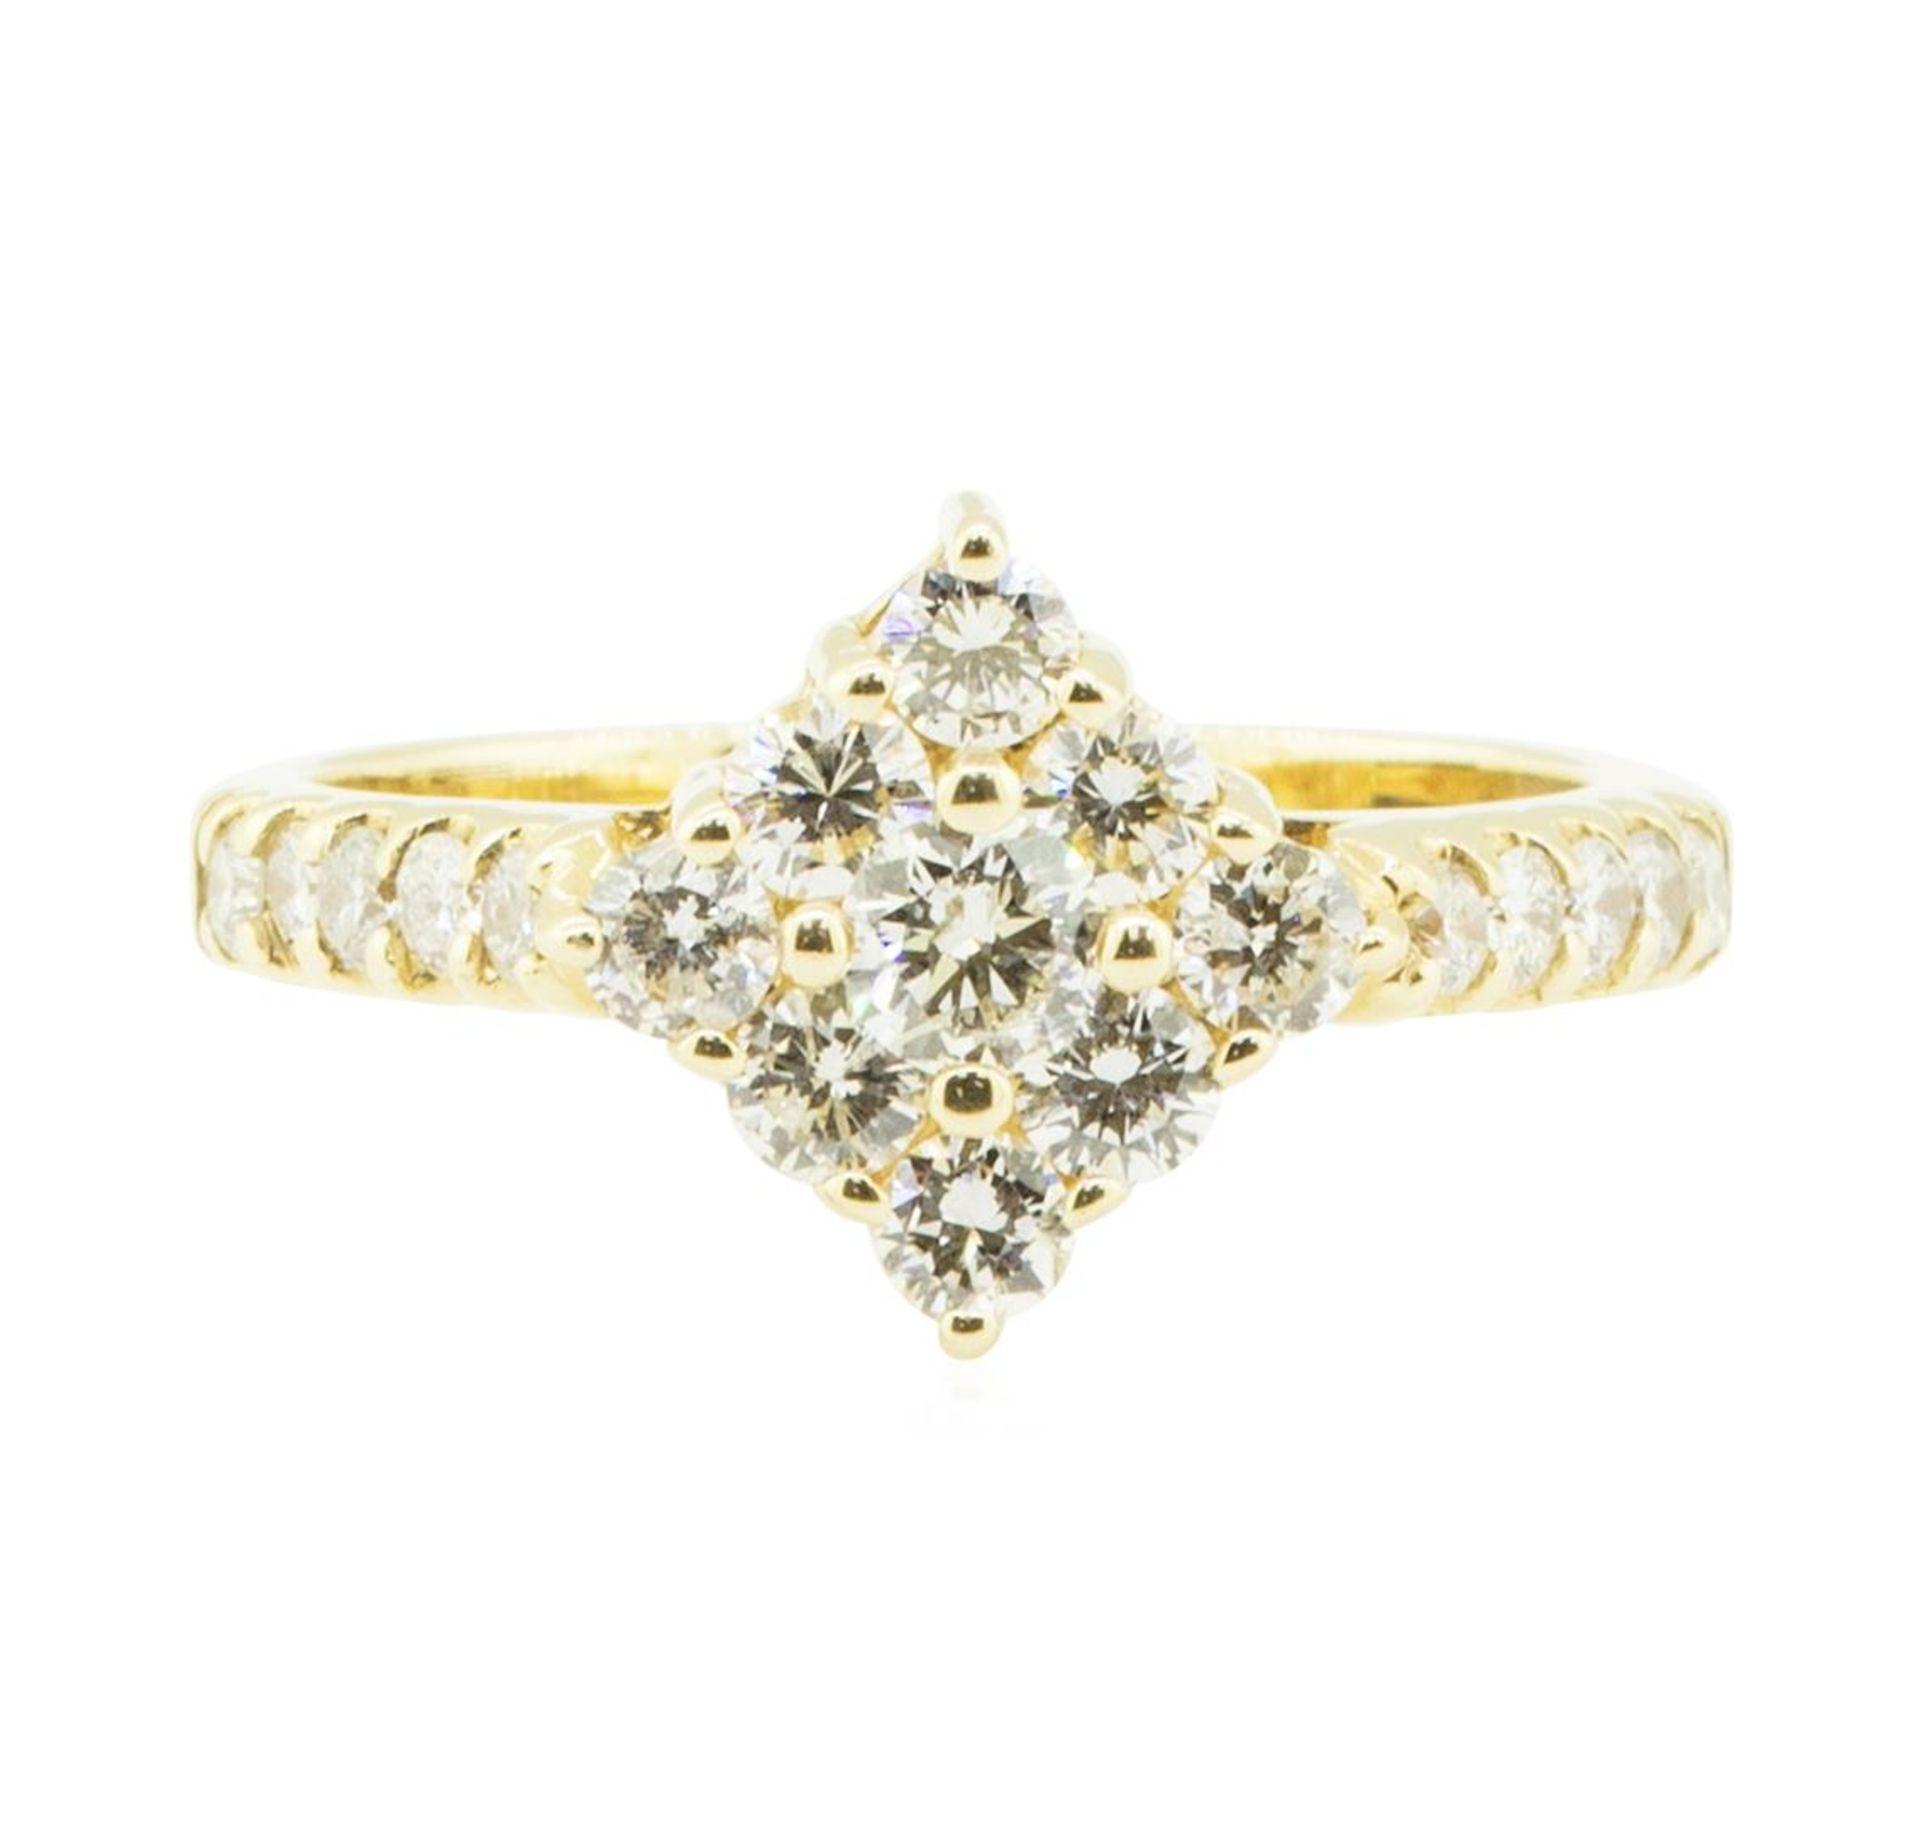 1.00 ctw Diamond Ring - 14KT Yellow Gold - Image 2 of 4